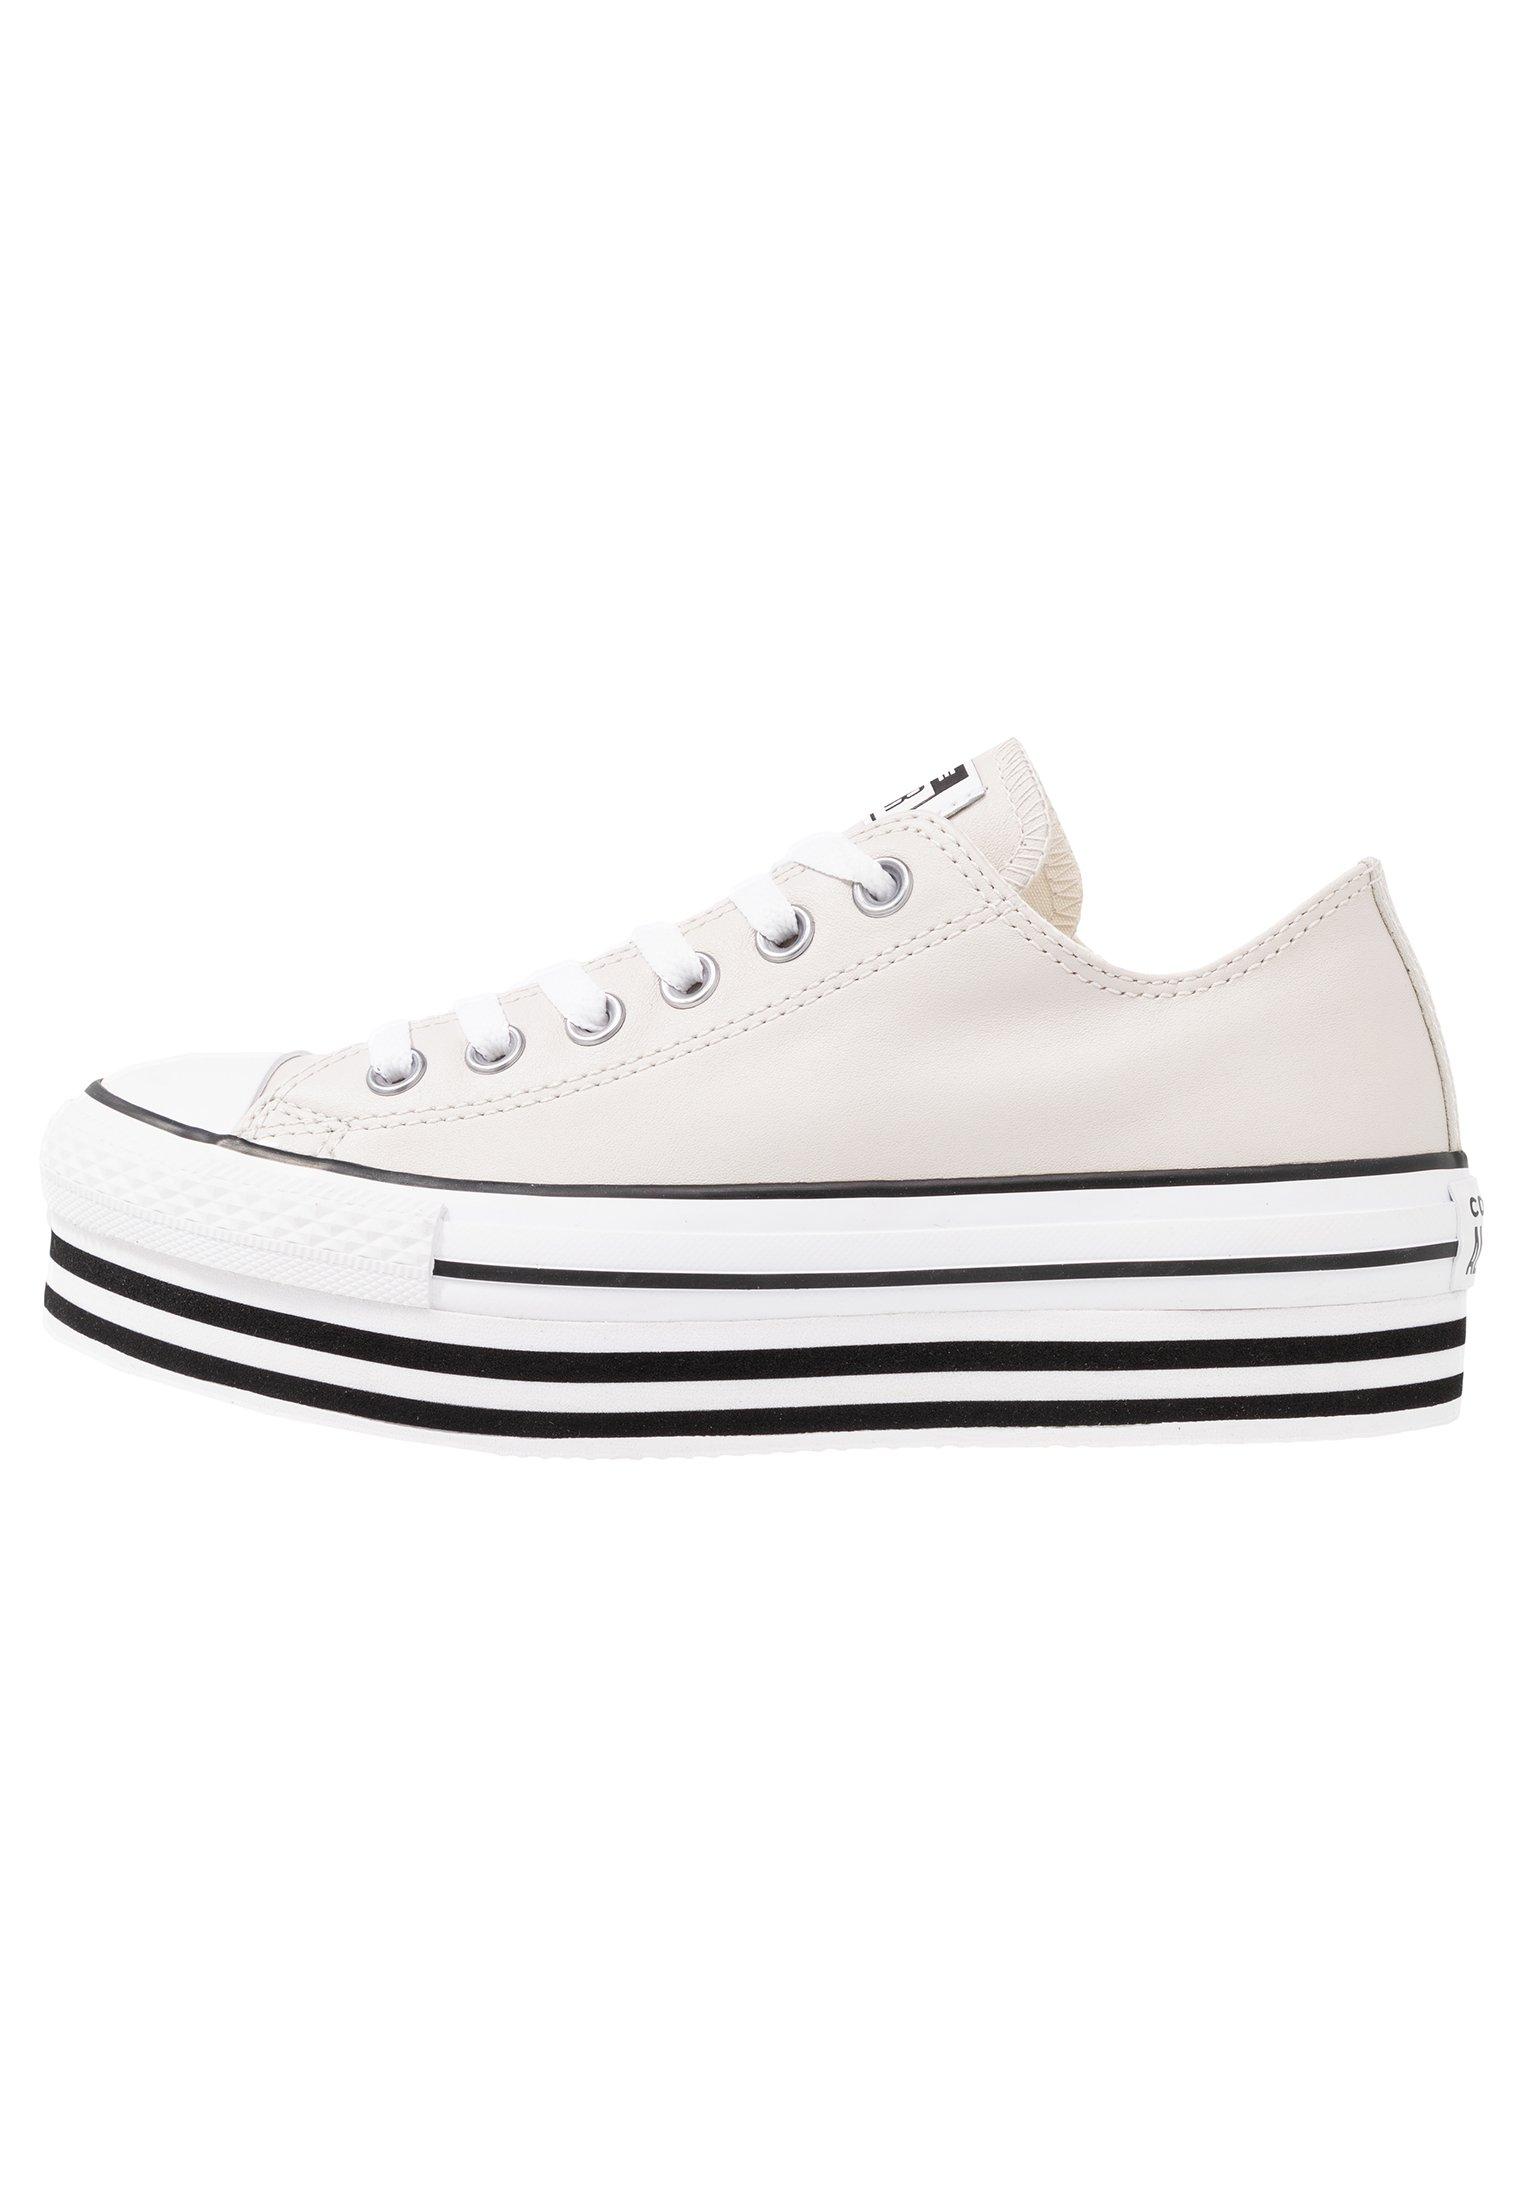 Converse CHUCK TAYLOR ALL STAR LAYER BOTTOM - Joggesko - pale putty/white/black